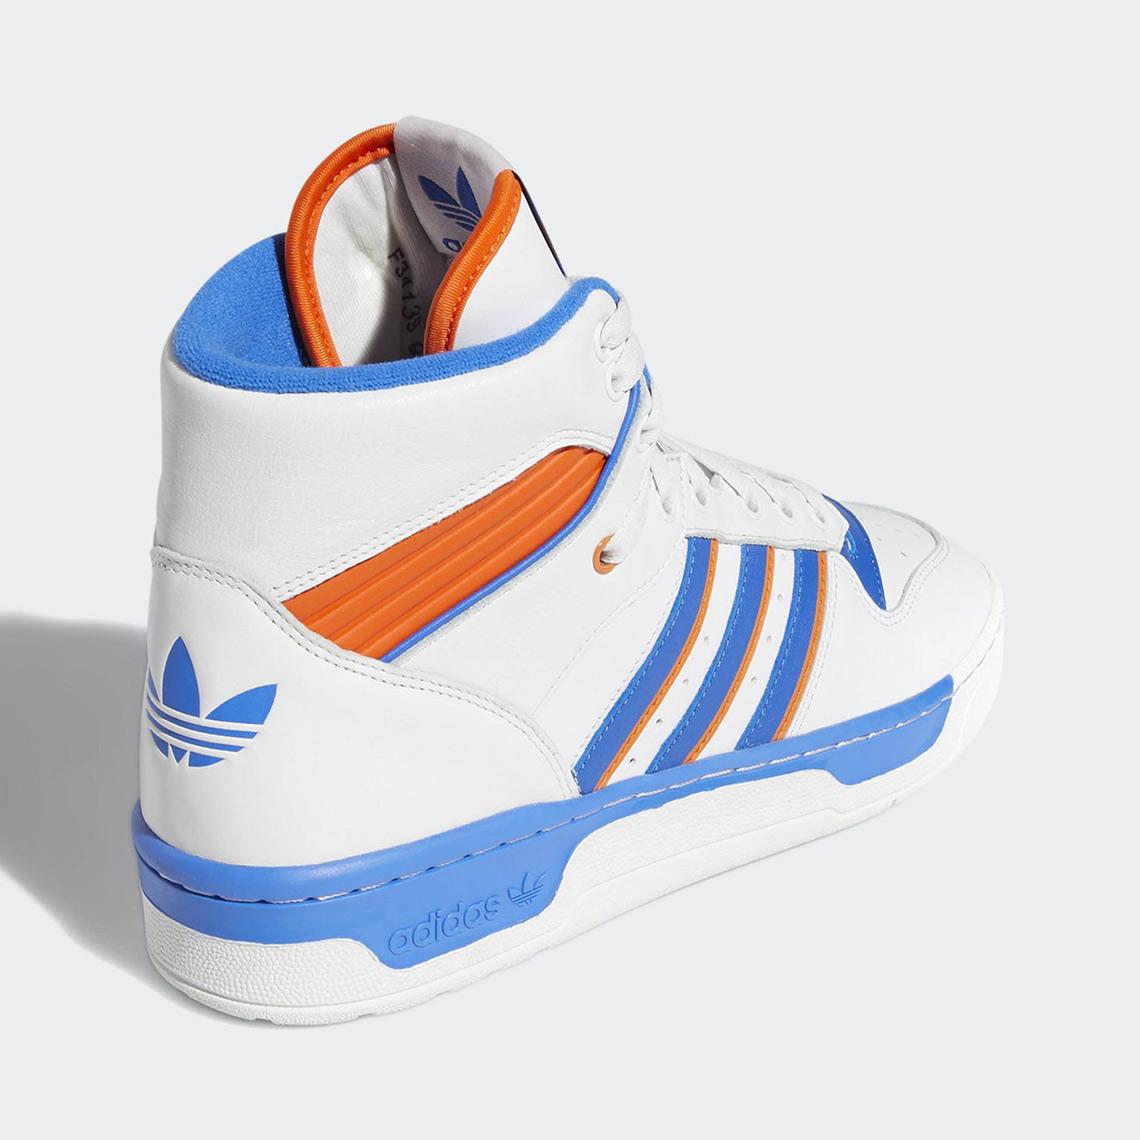 adidas Rivalry Hi Style Code  F34139 (Knicks) Style Code  BD8021 (Black  White) 0b302f947697